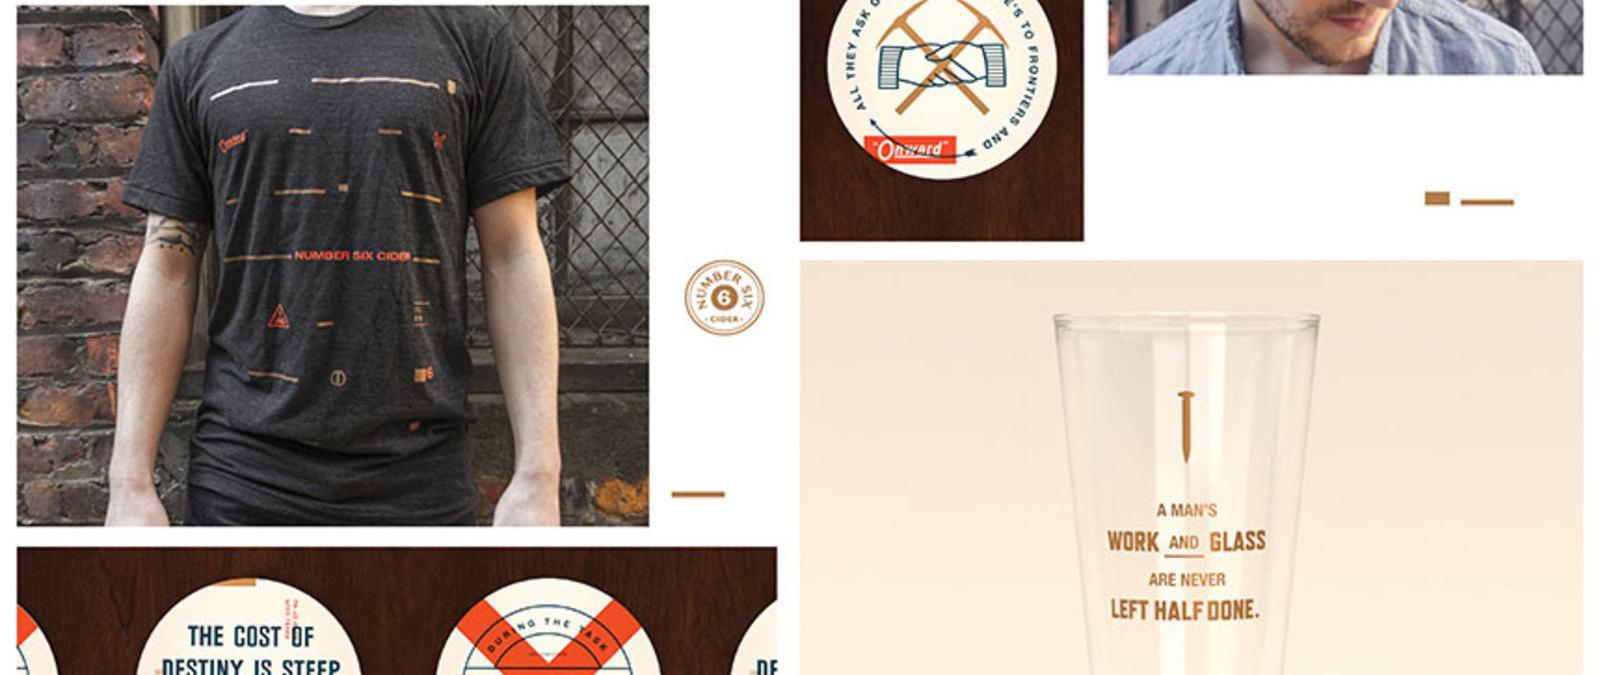 No. 6 Cider Promotional Materials